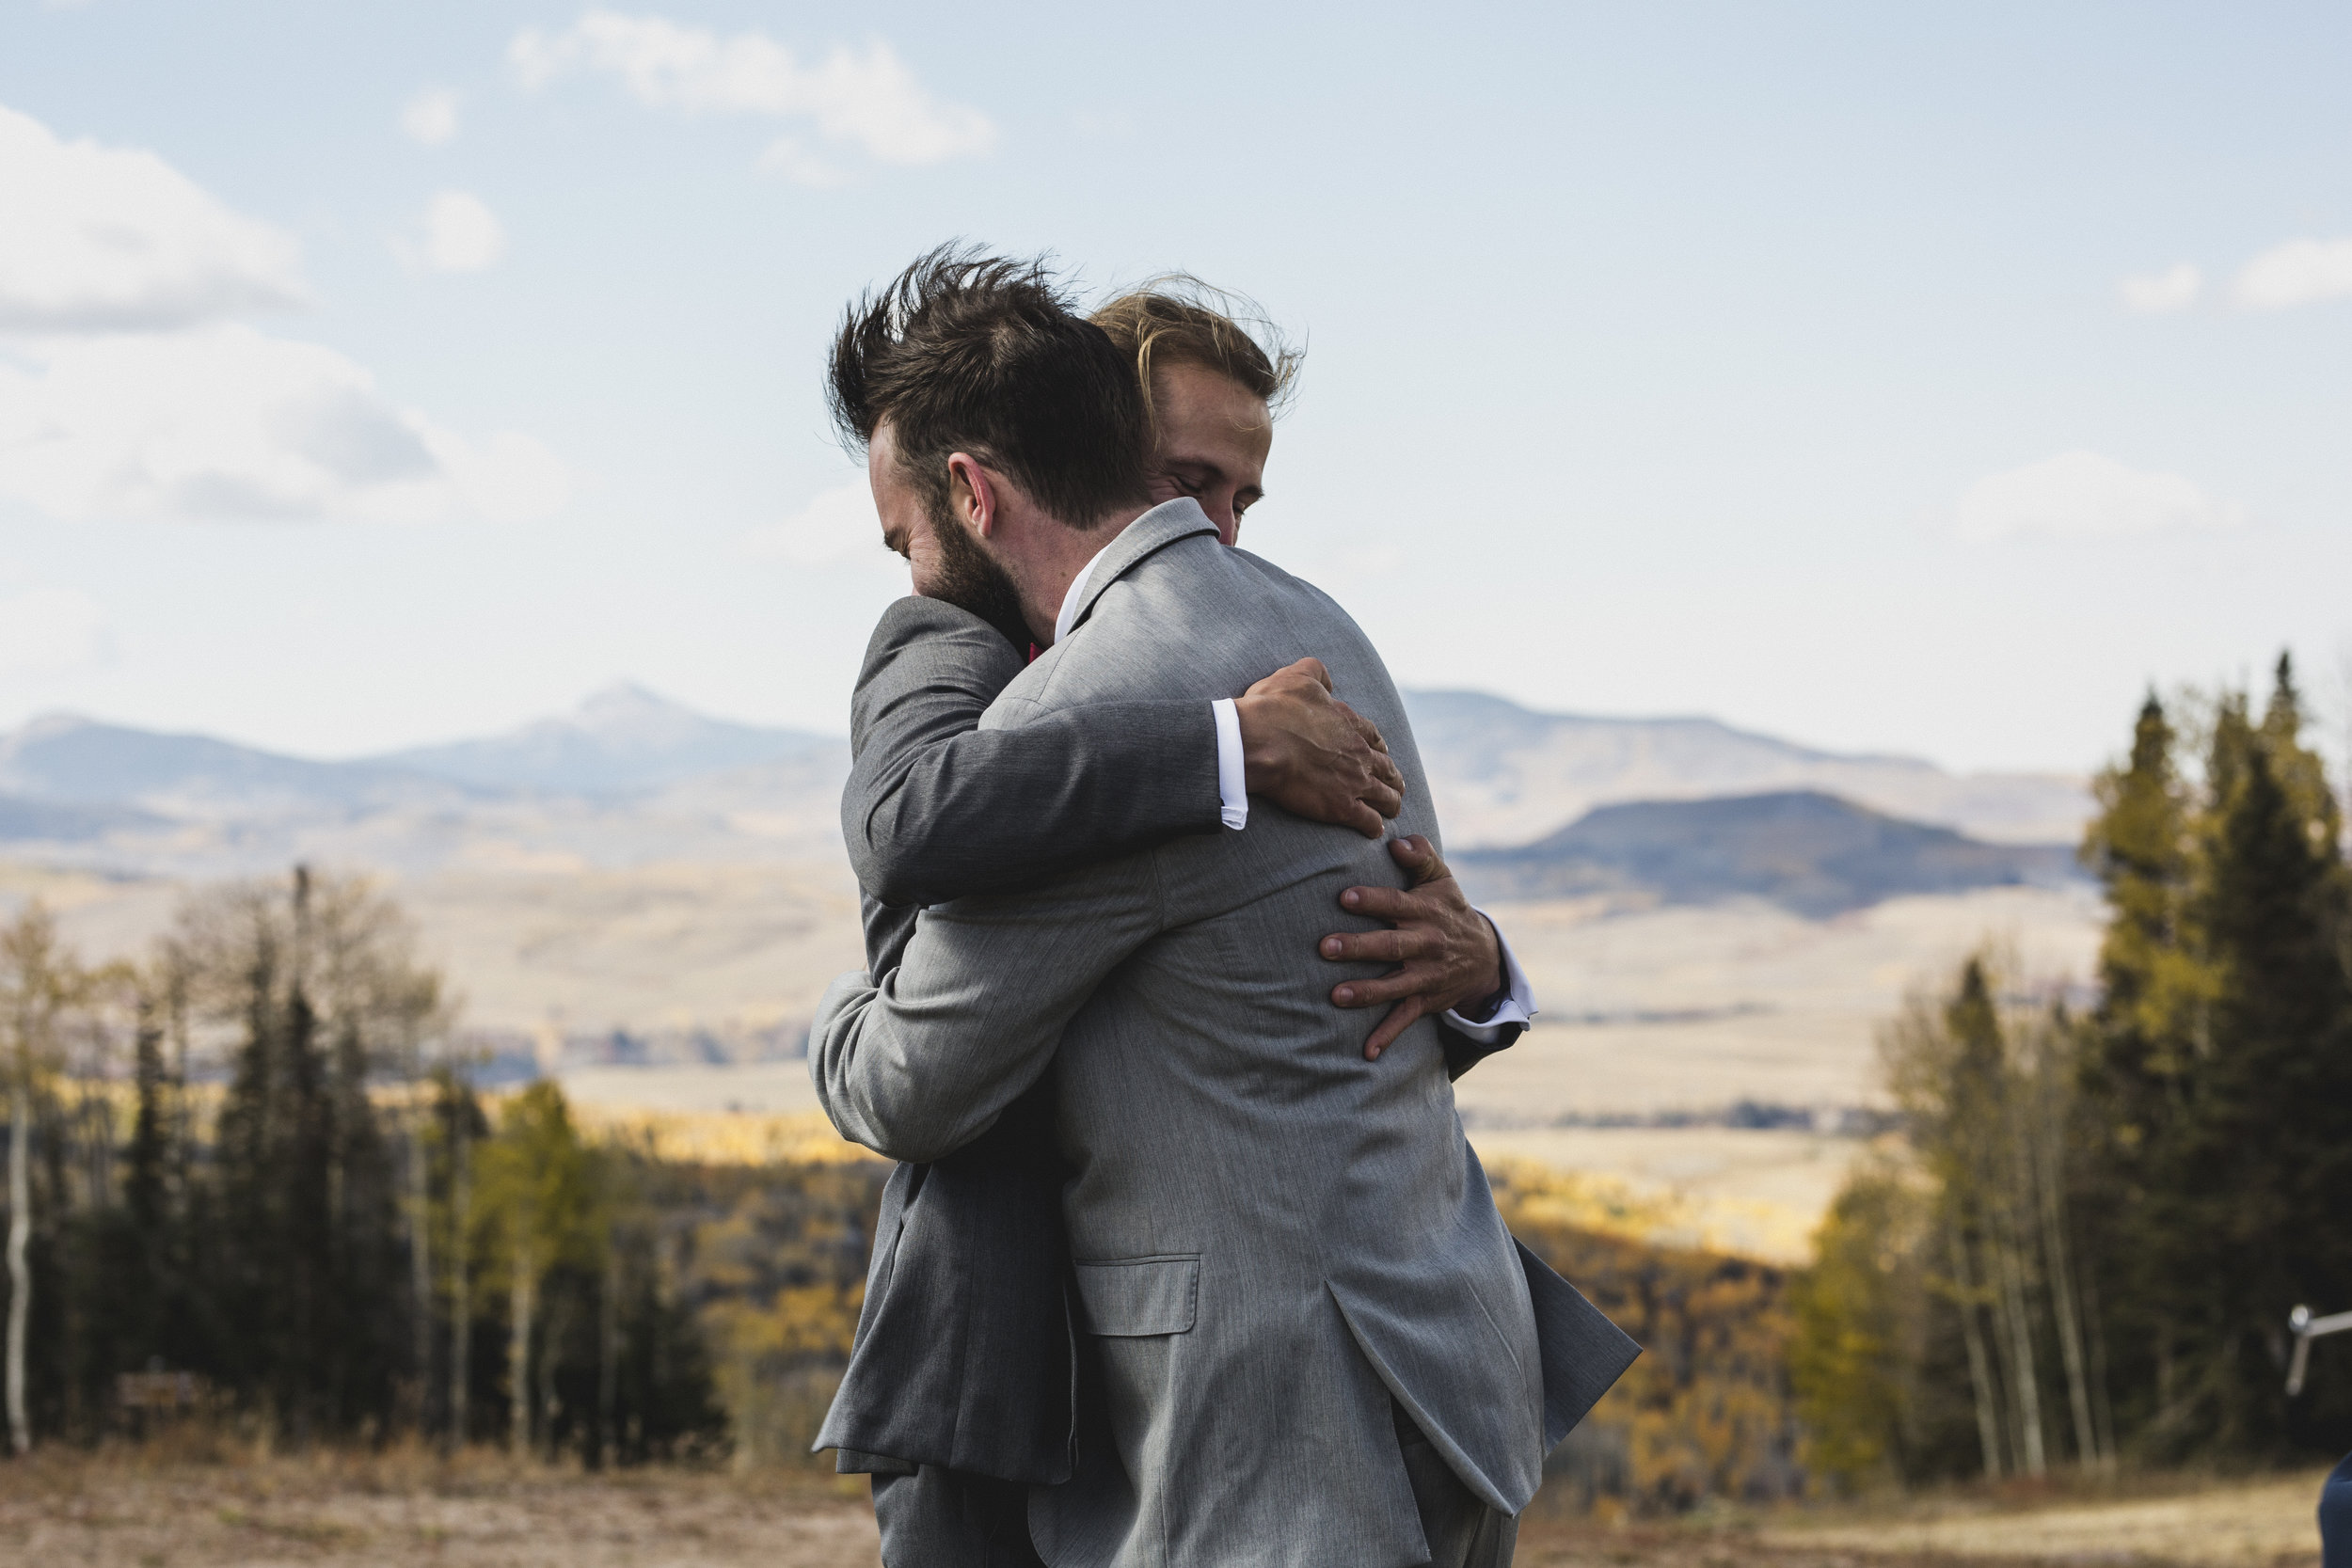 NE-LeahandAshtonphotography-Telluride-Wedding-Photography-9454.jpg